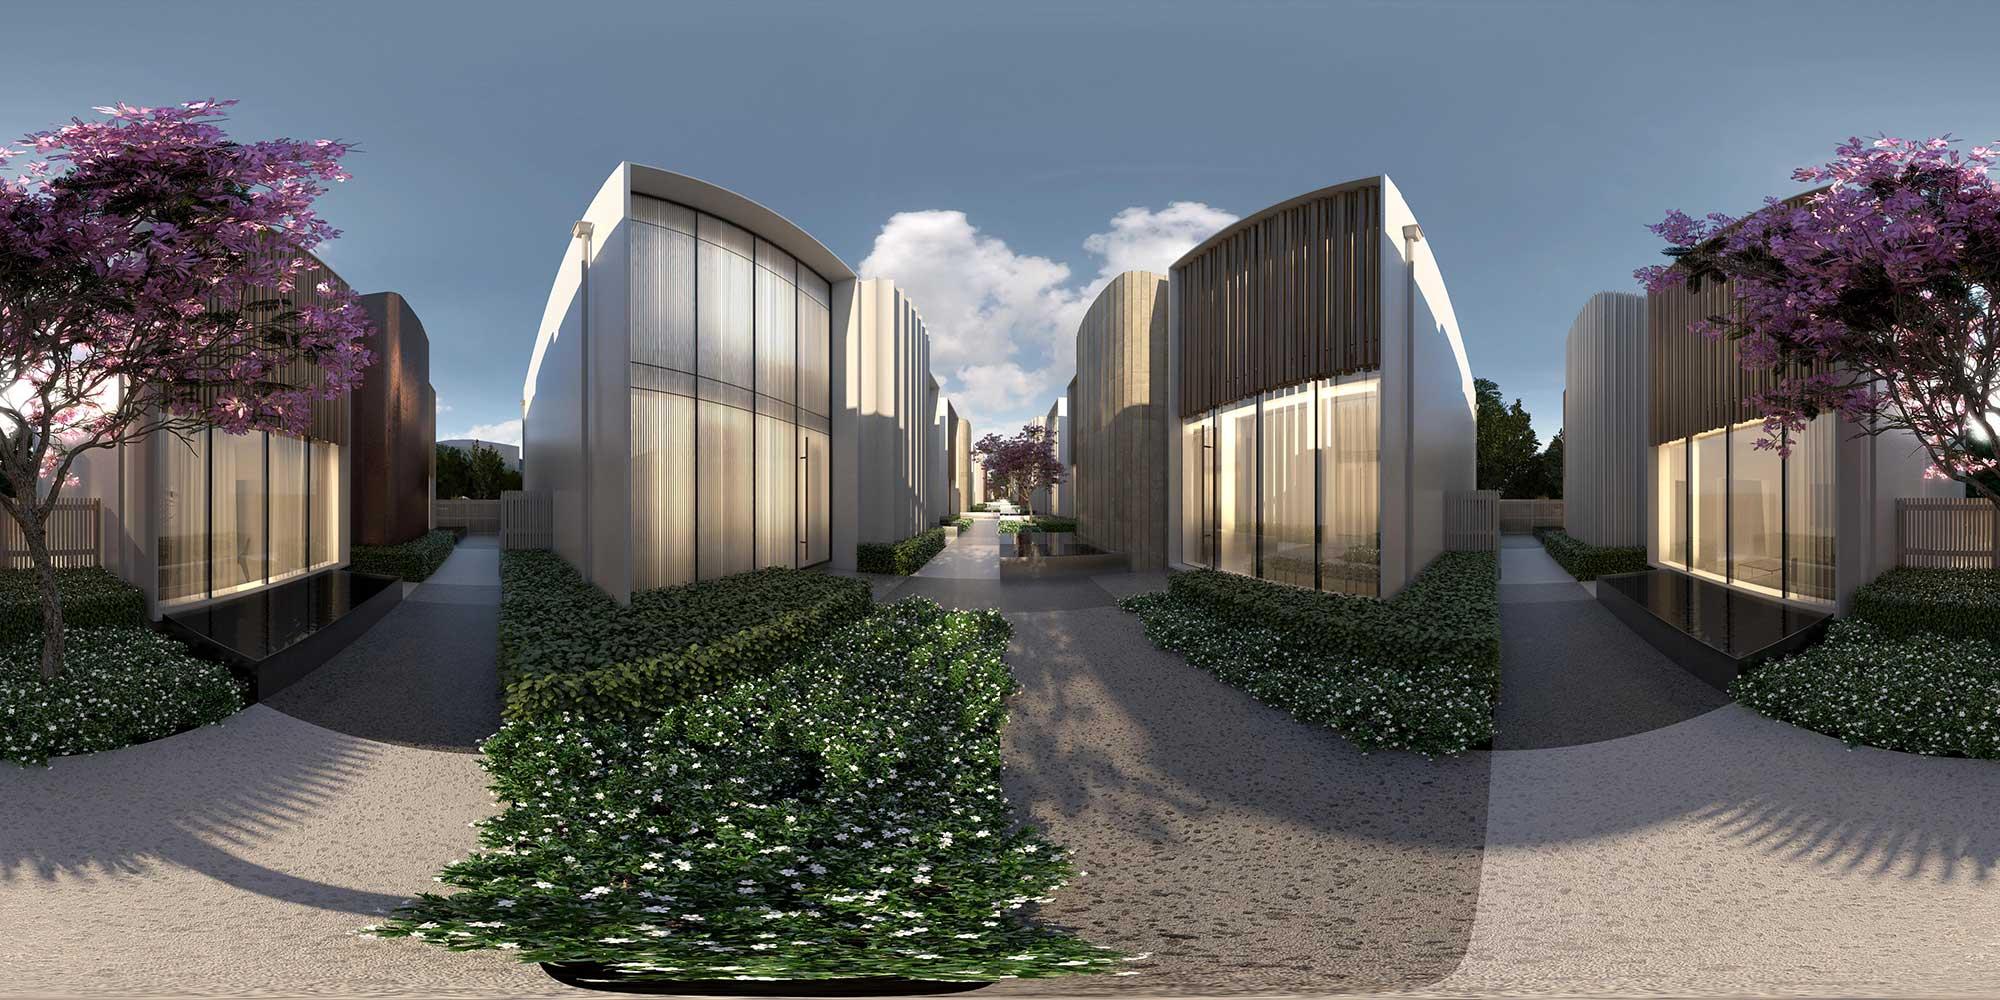 360-vr-architecture-visualisation-images-renders-FKD-Studio